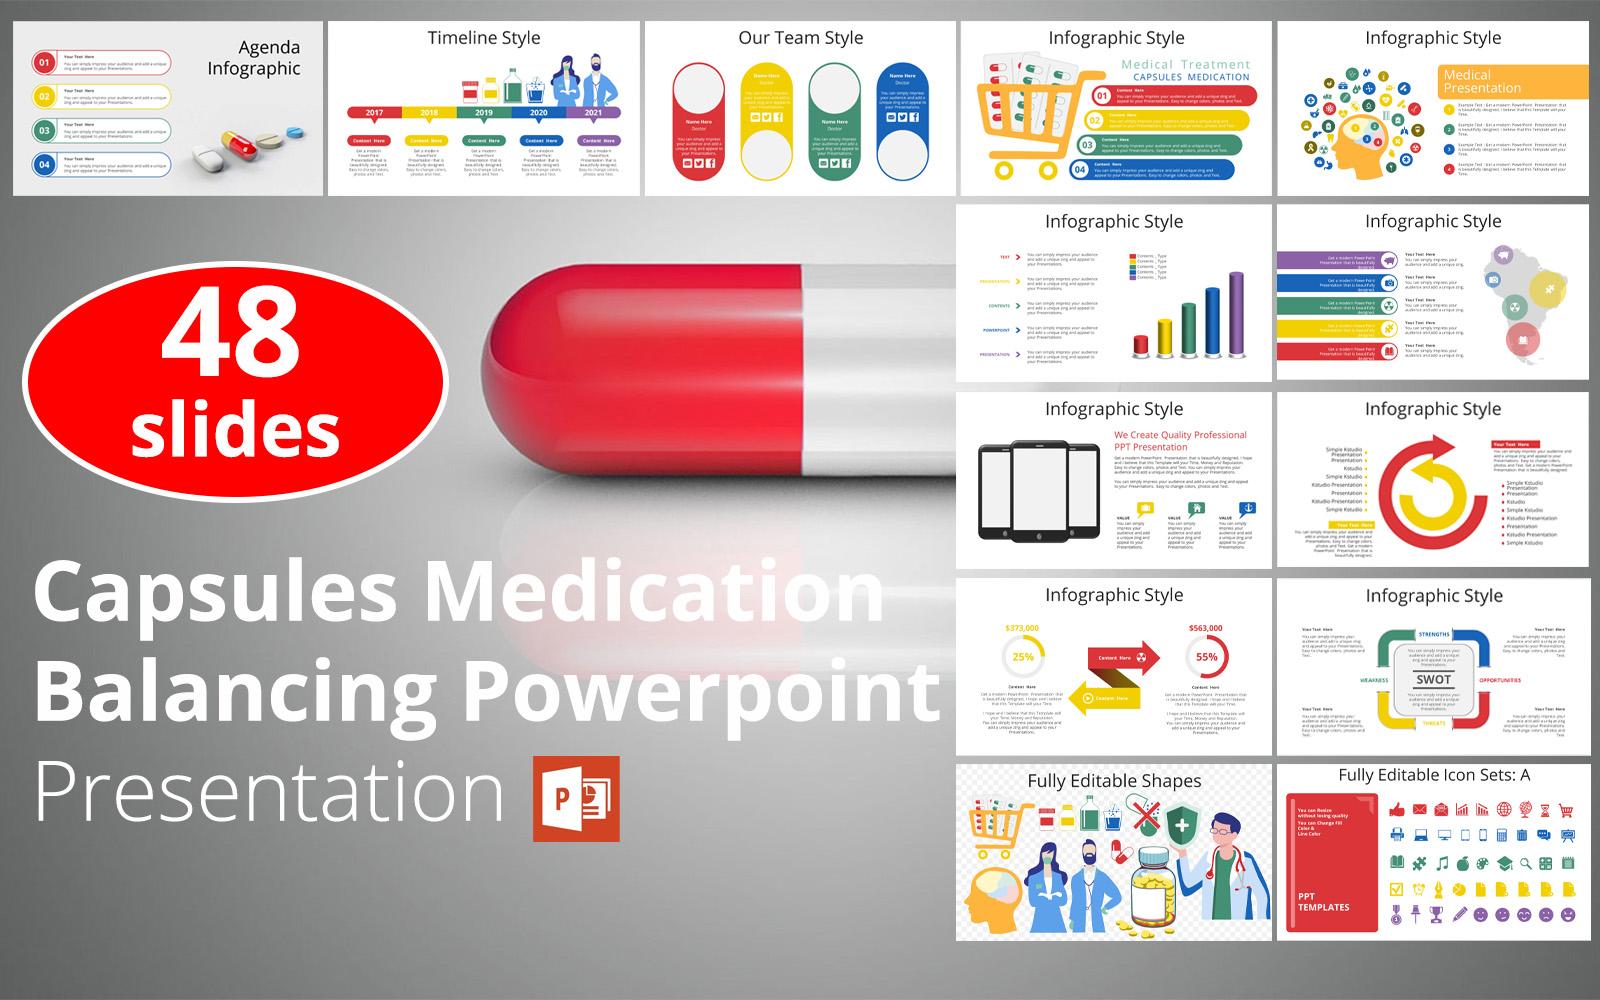 Capsules Medication Balancing Powerpoint Presentation